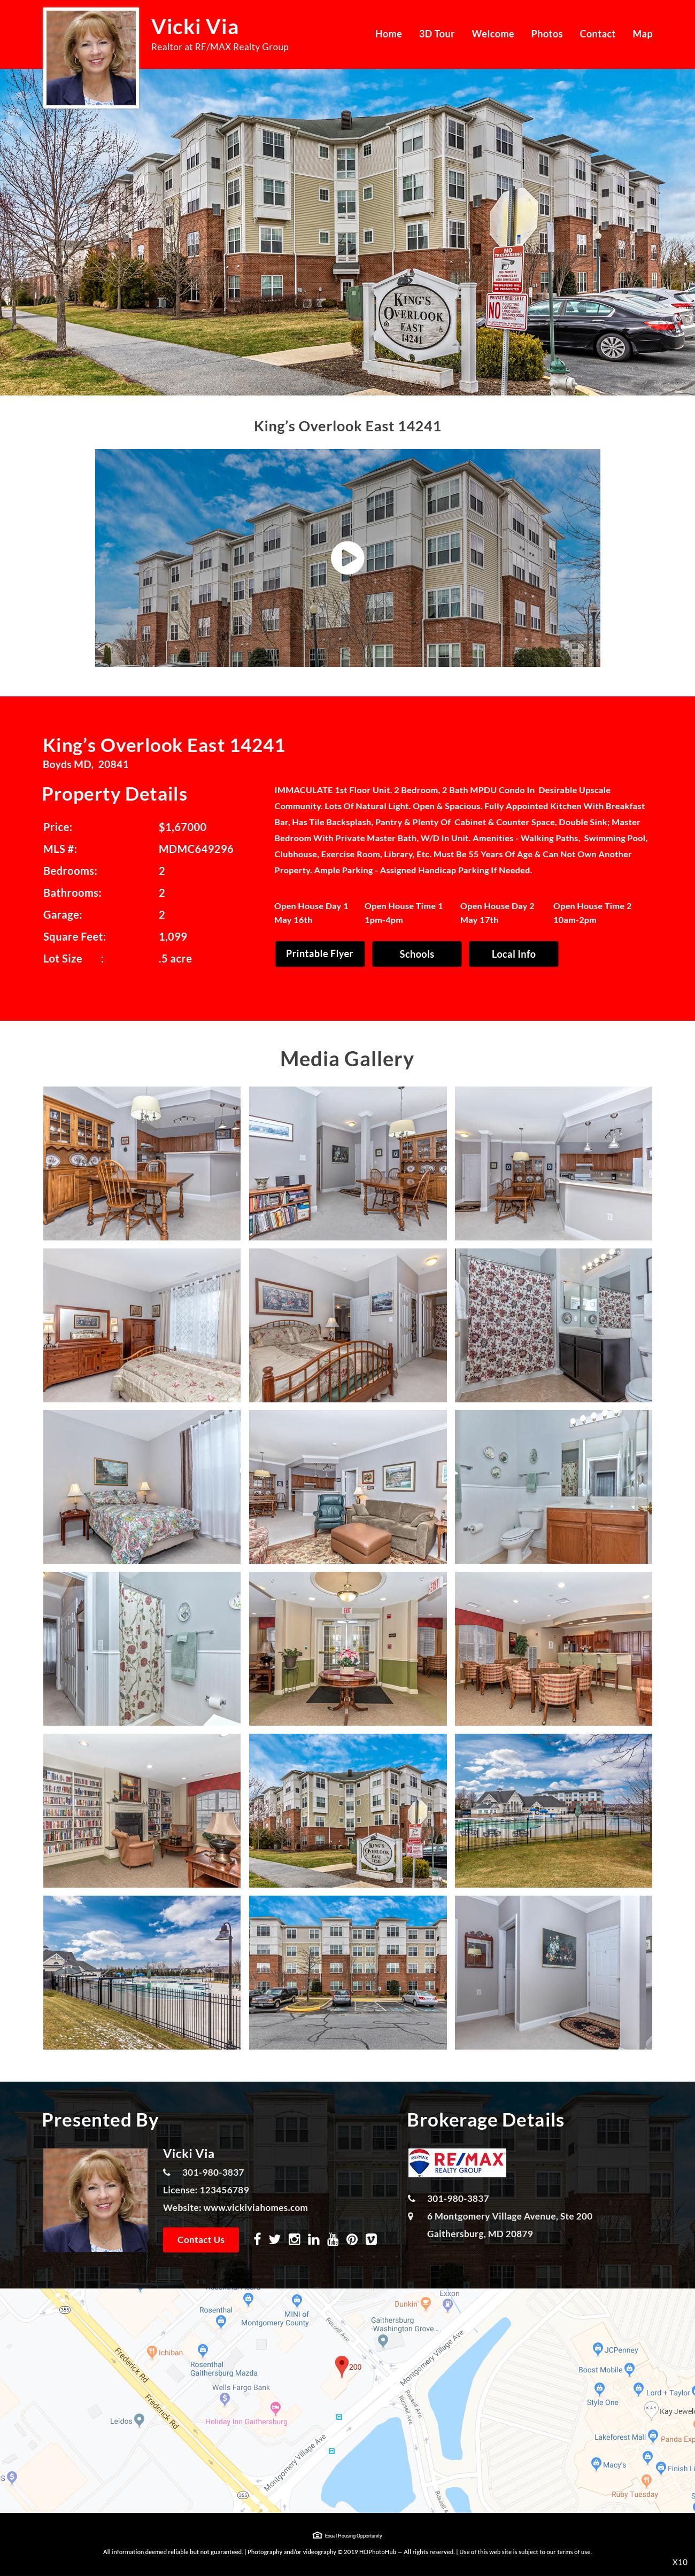 Participating Entry #16 for Website Design contest - Single Real Estate Property Listing Website Template - original